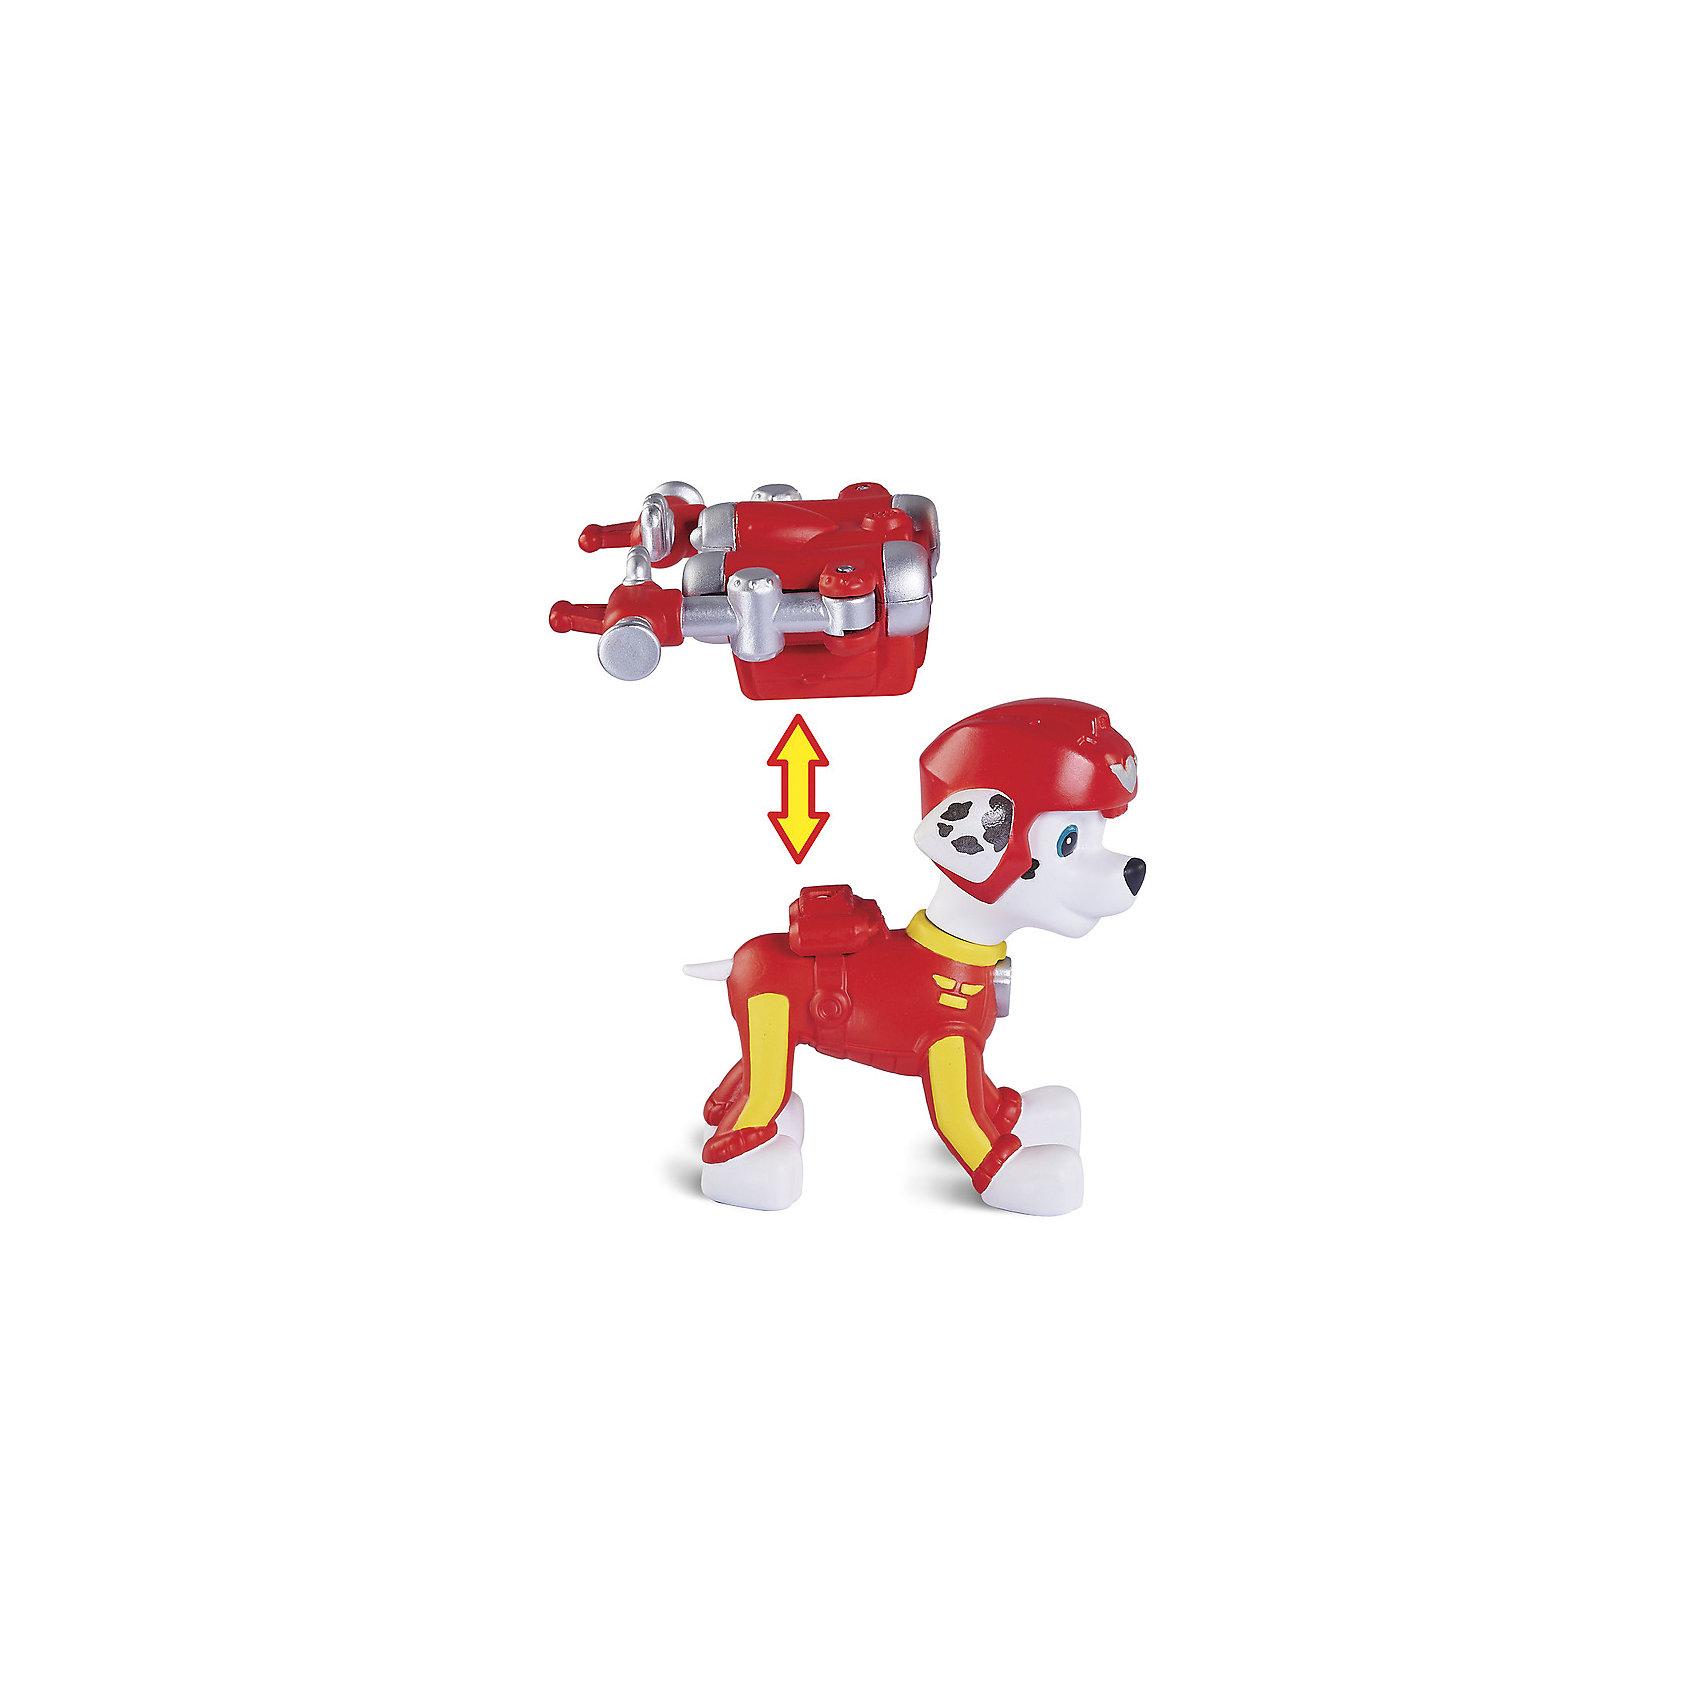 Spin Master Фигурка воздушного спасателя Маршал, Щенячий Патруль spin master фигурка спасателя с рюкзаком трансформером рокки щенячий патруль spin master